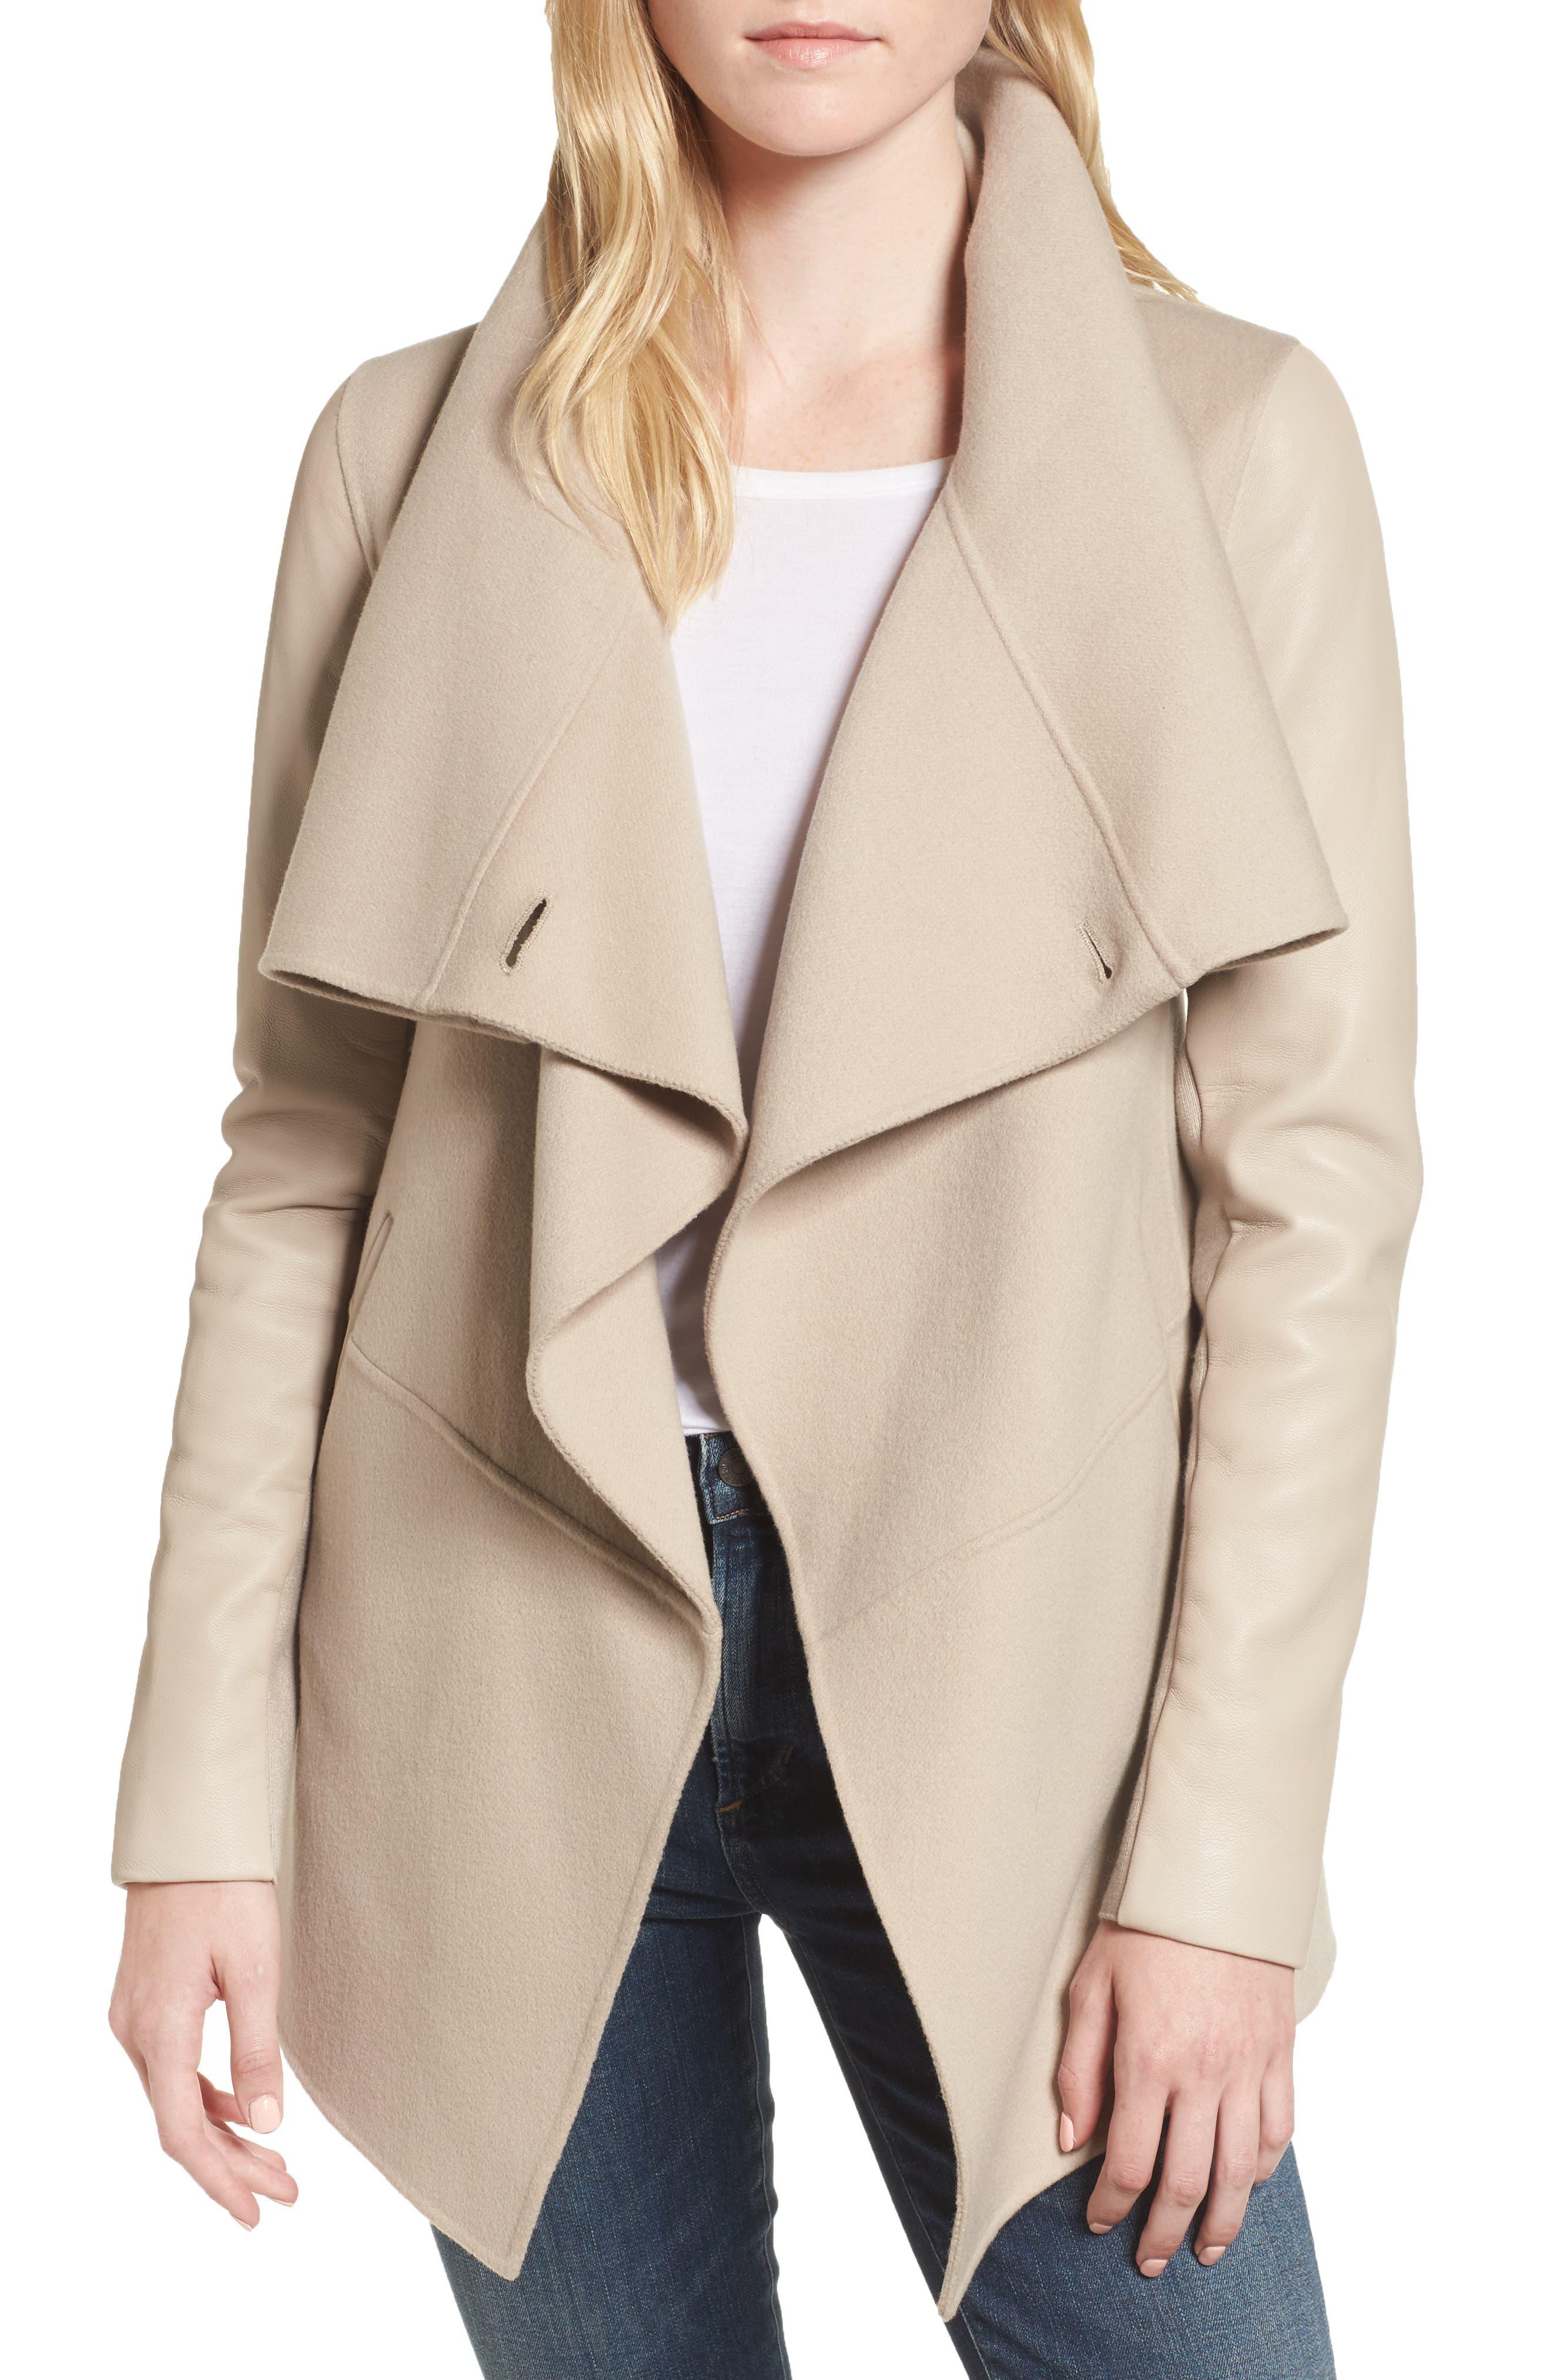 Vane Asymmetrical Leather Sleeve Coat,                         Main,                         color, Sand